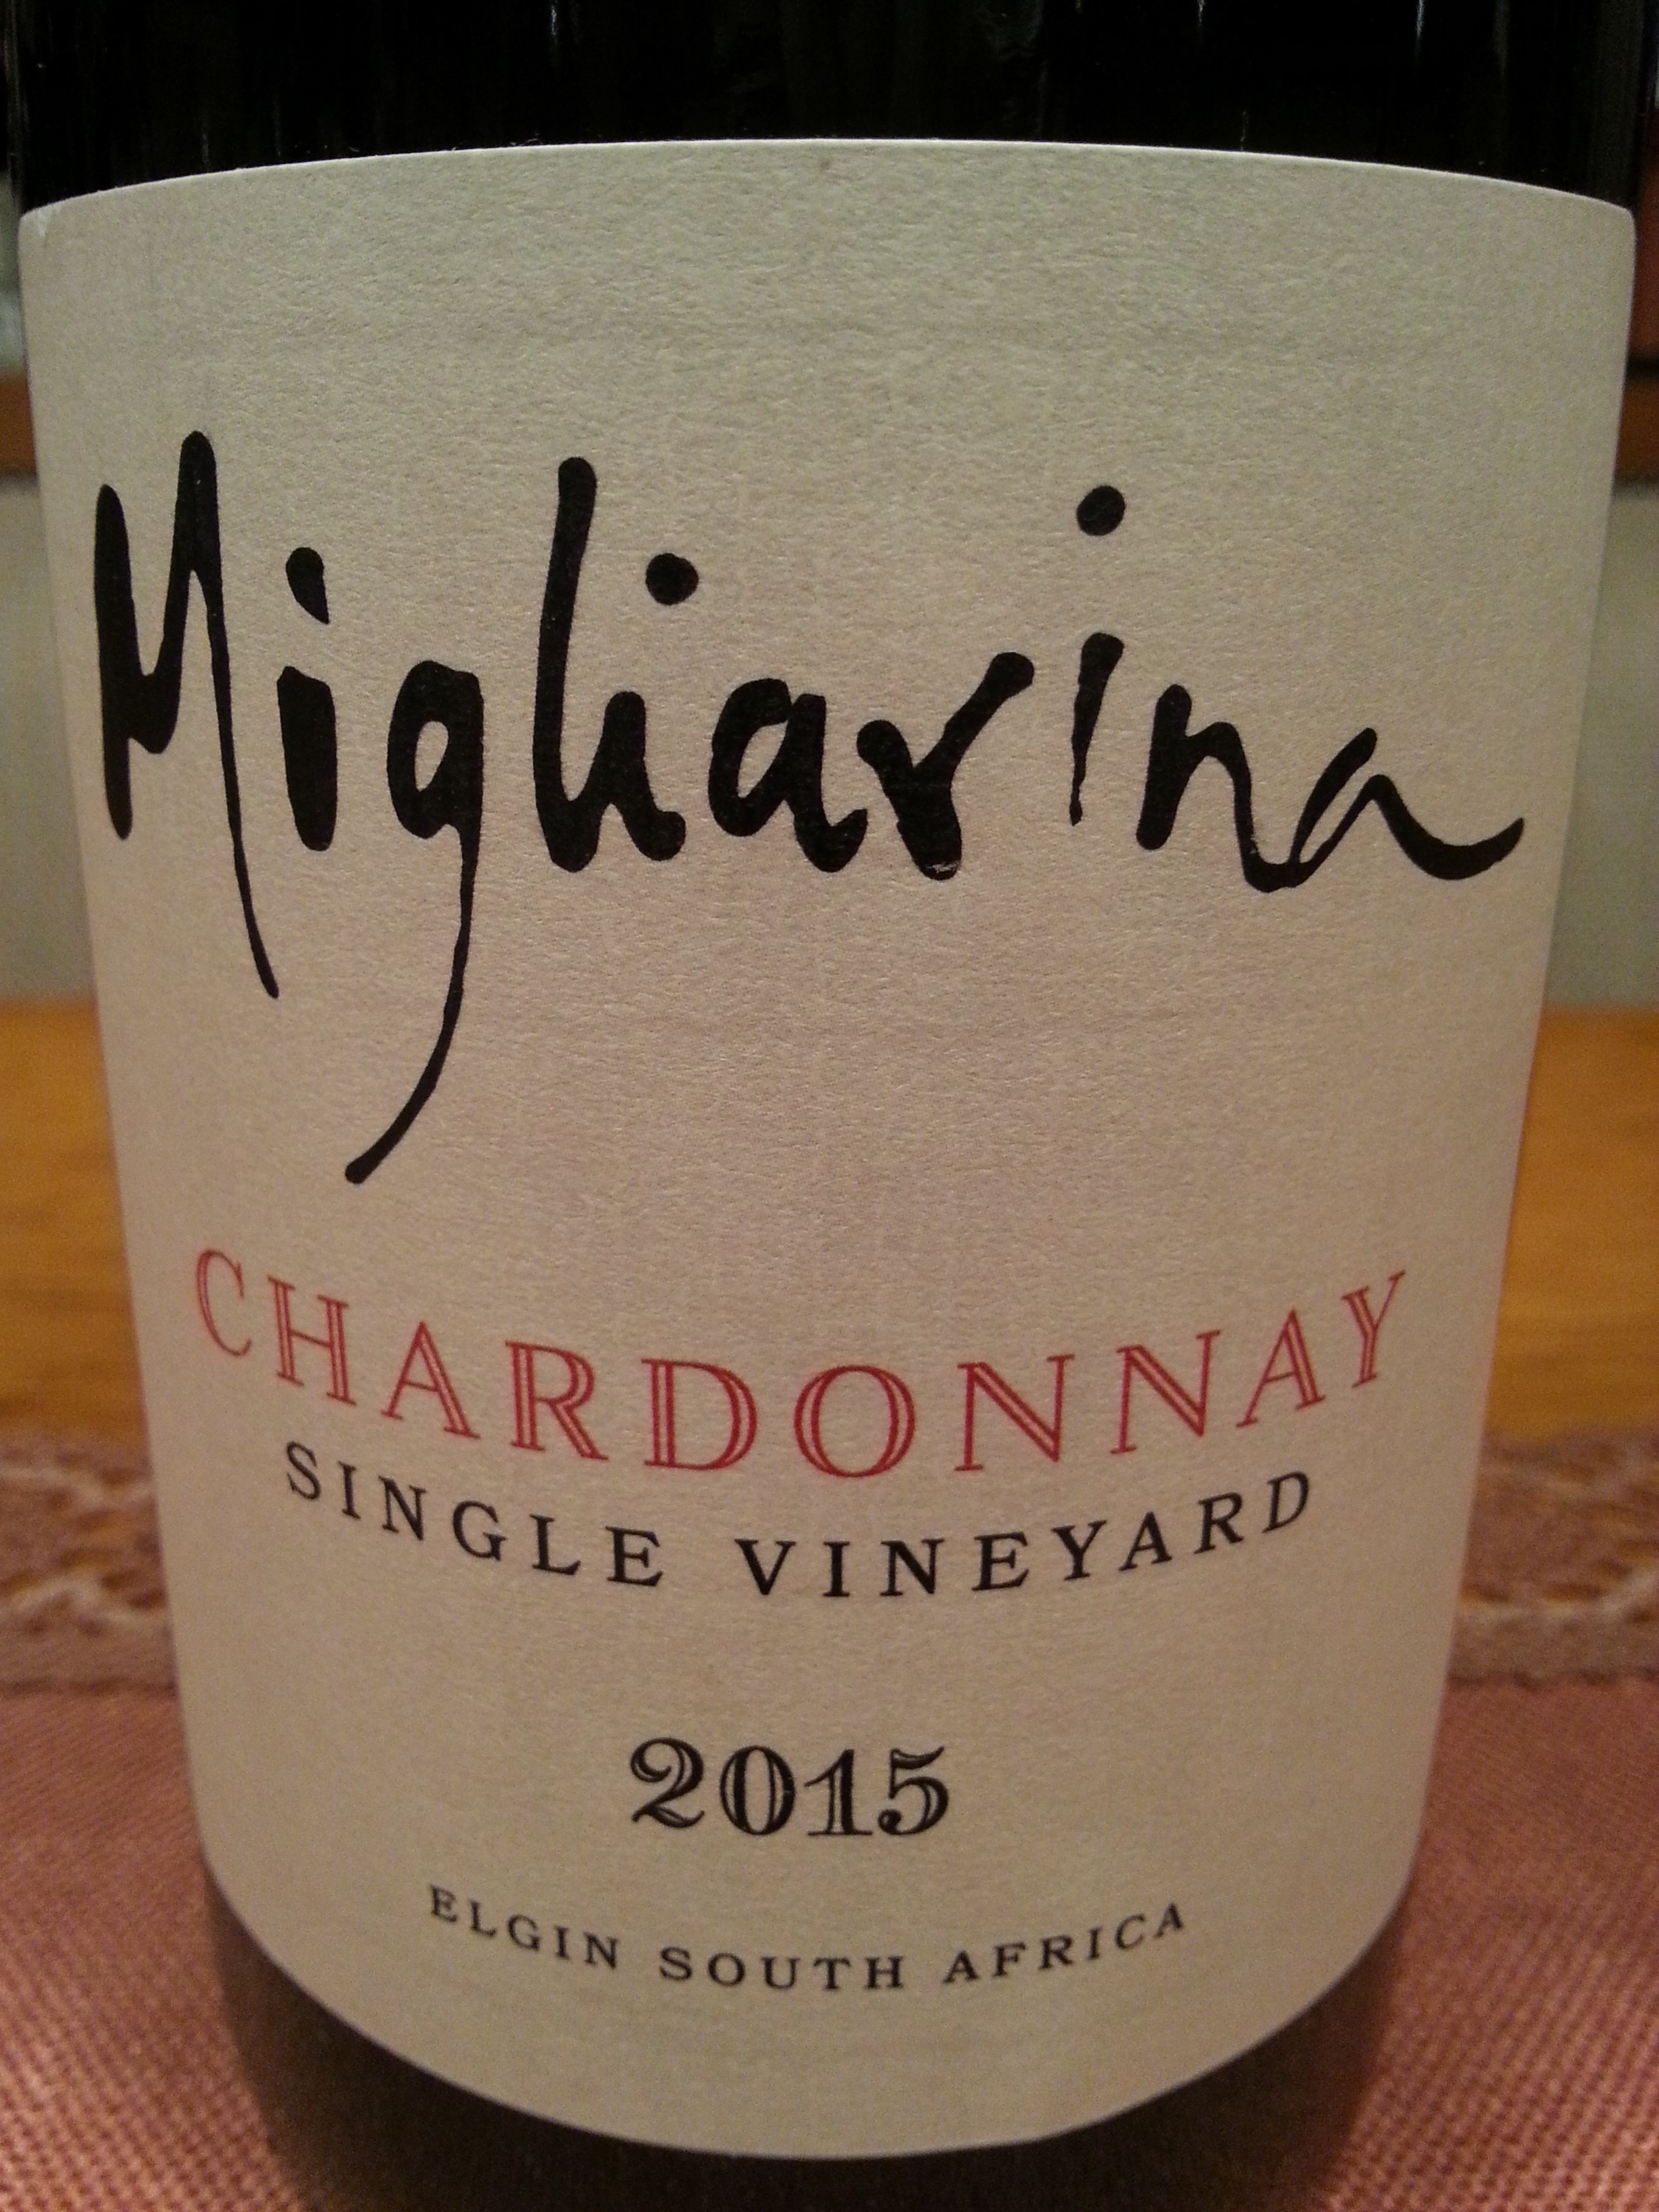 2015 Chardonnay Single Vineyard | Migliarina